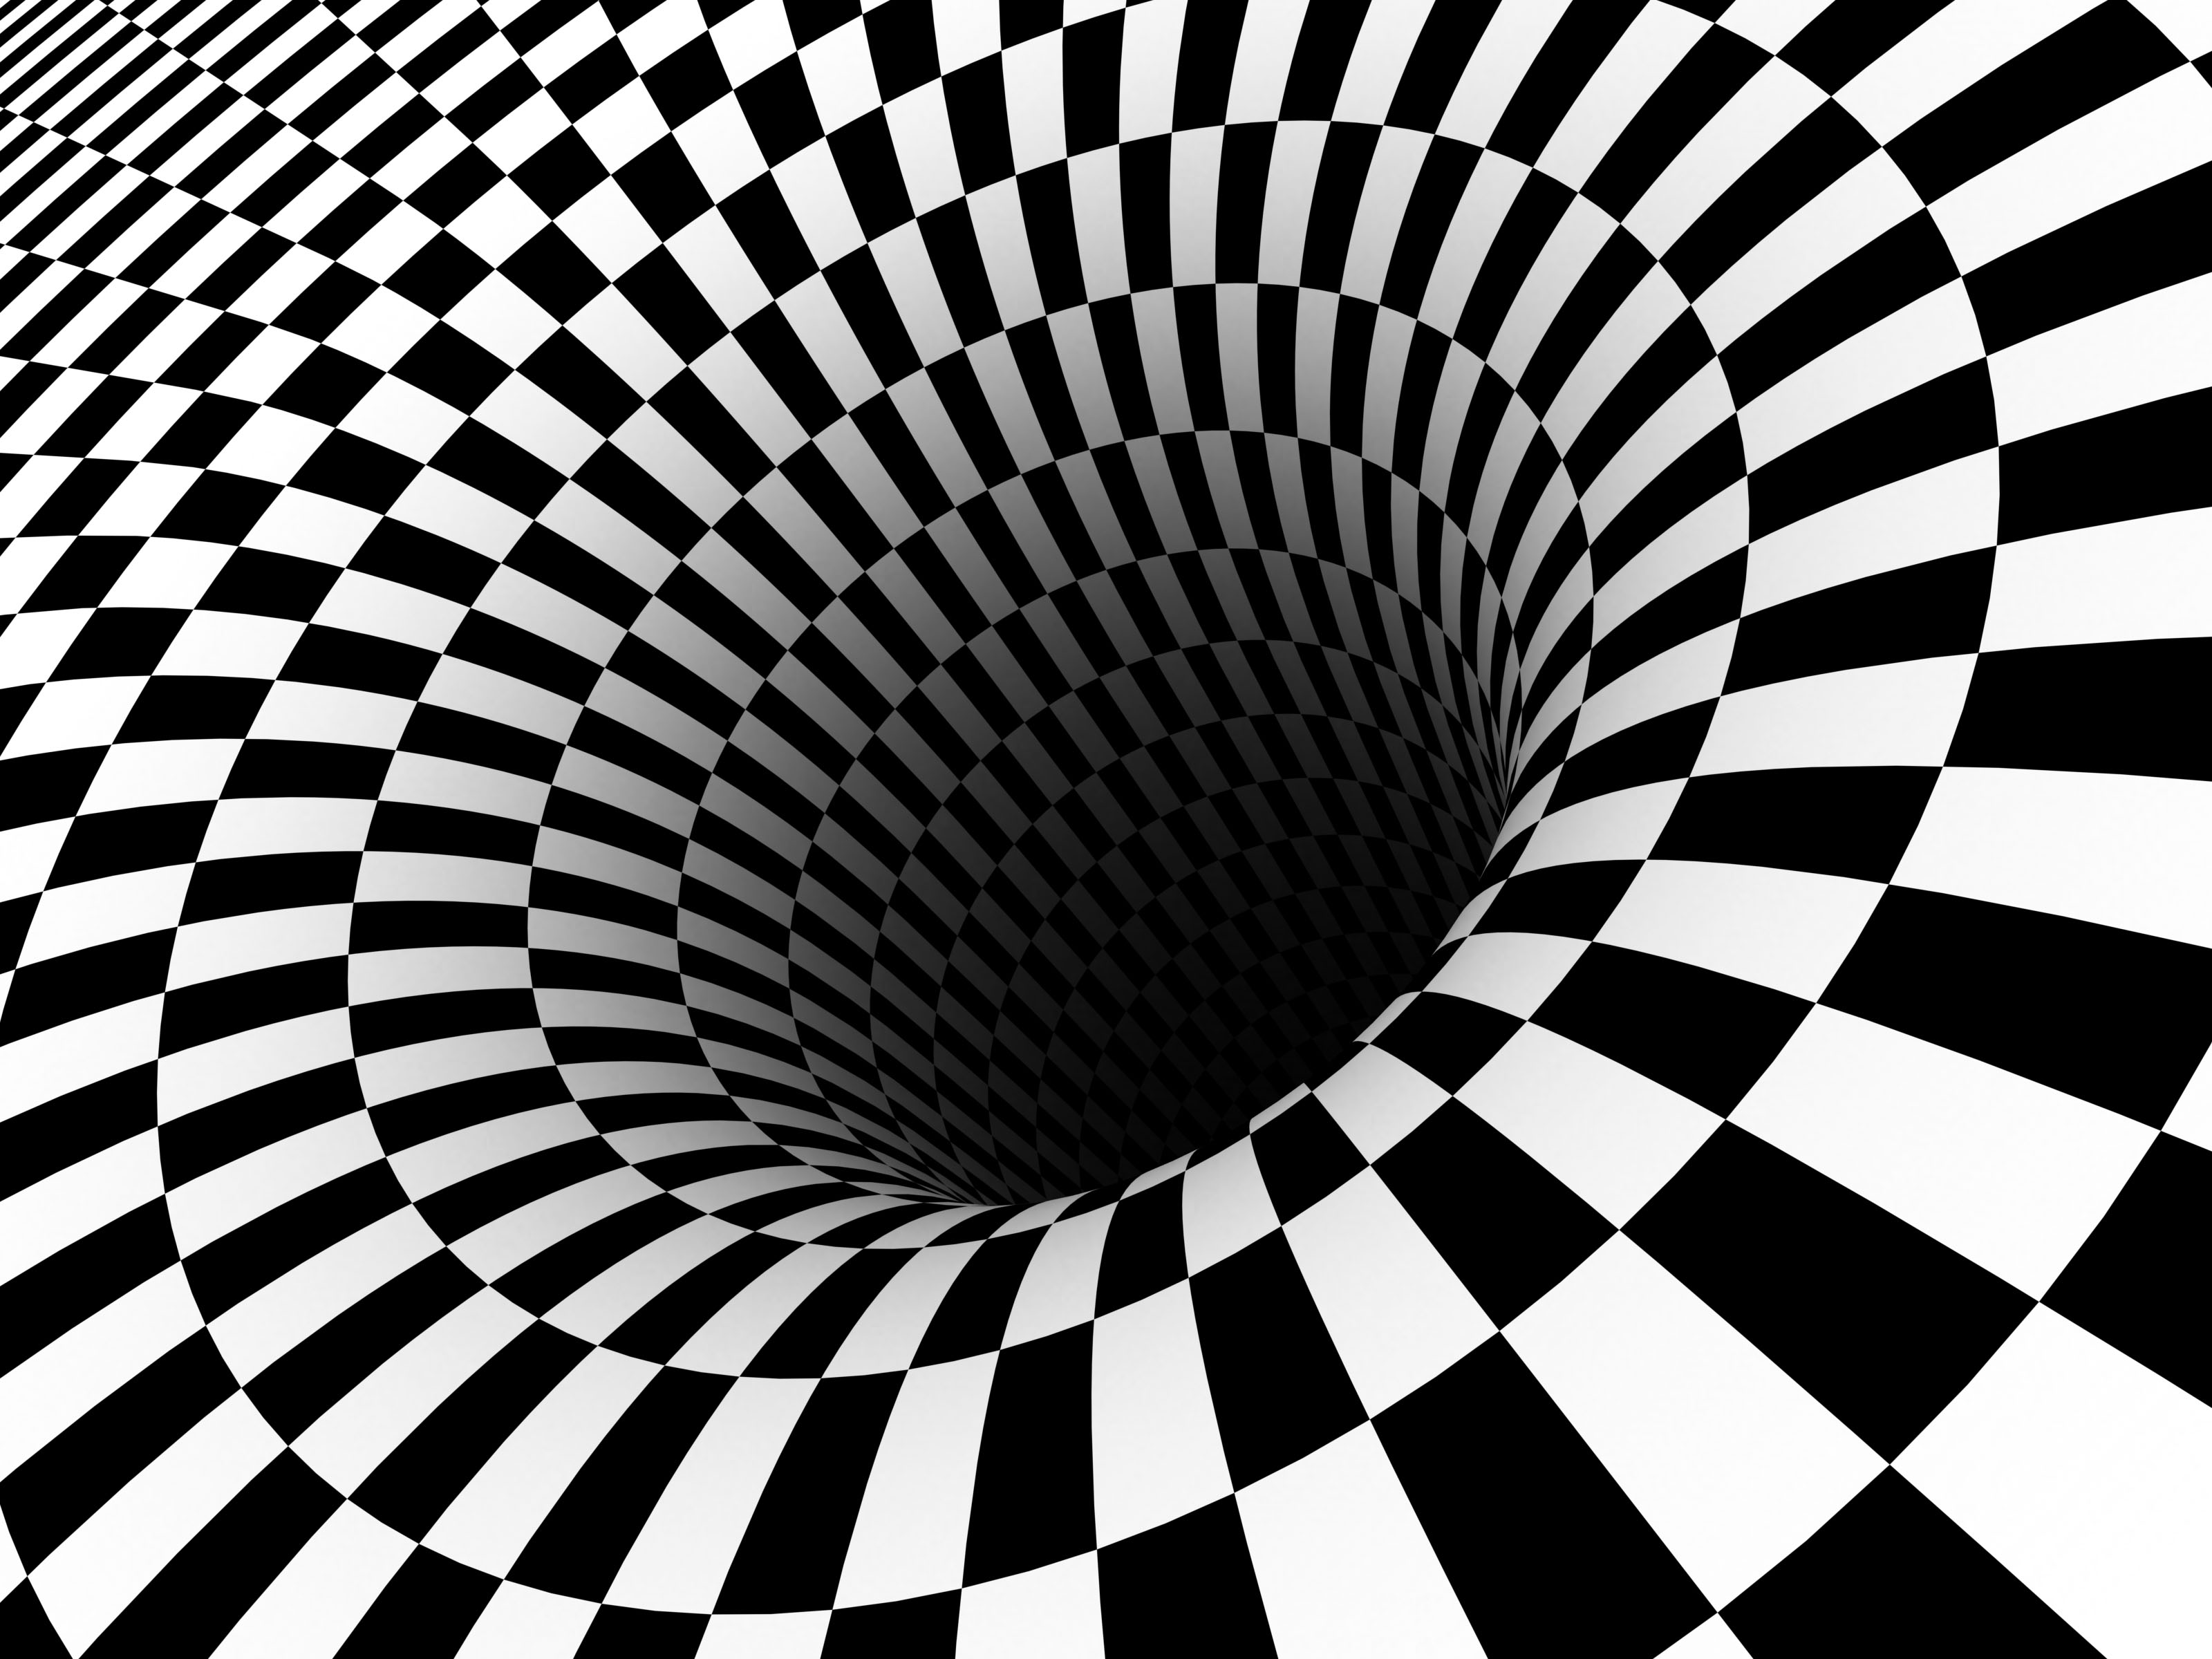 3200x2400 Deep Hole Illusion!!! Hahahahahahahahahahahahahaha!!!